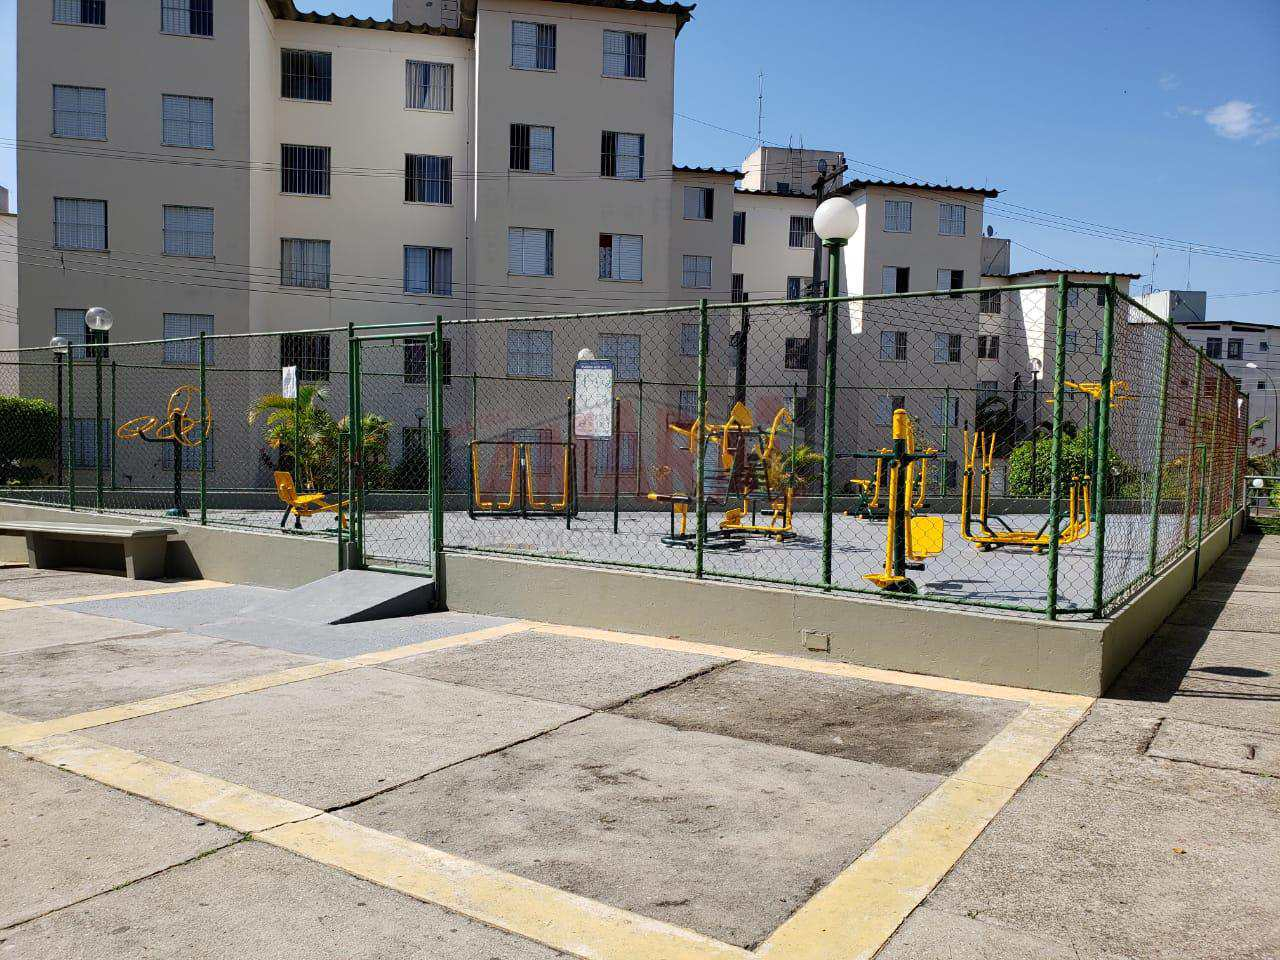 Apartamento com 2 dorms, Cidade Satélite Santa Bárbara, São Paulo - R$ 198 mil, Cod: 10830